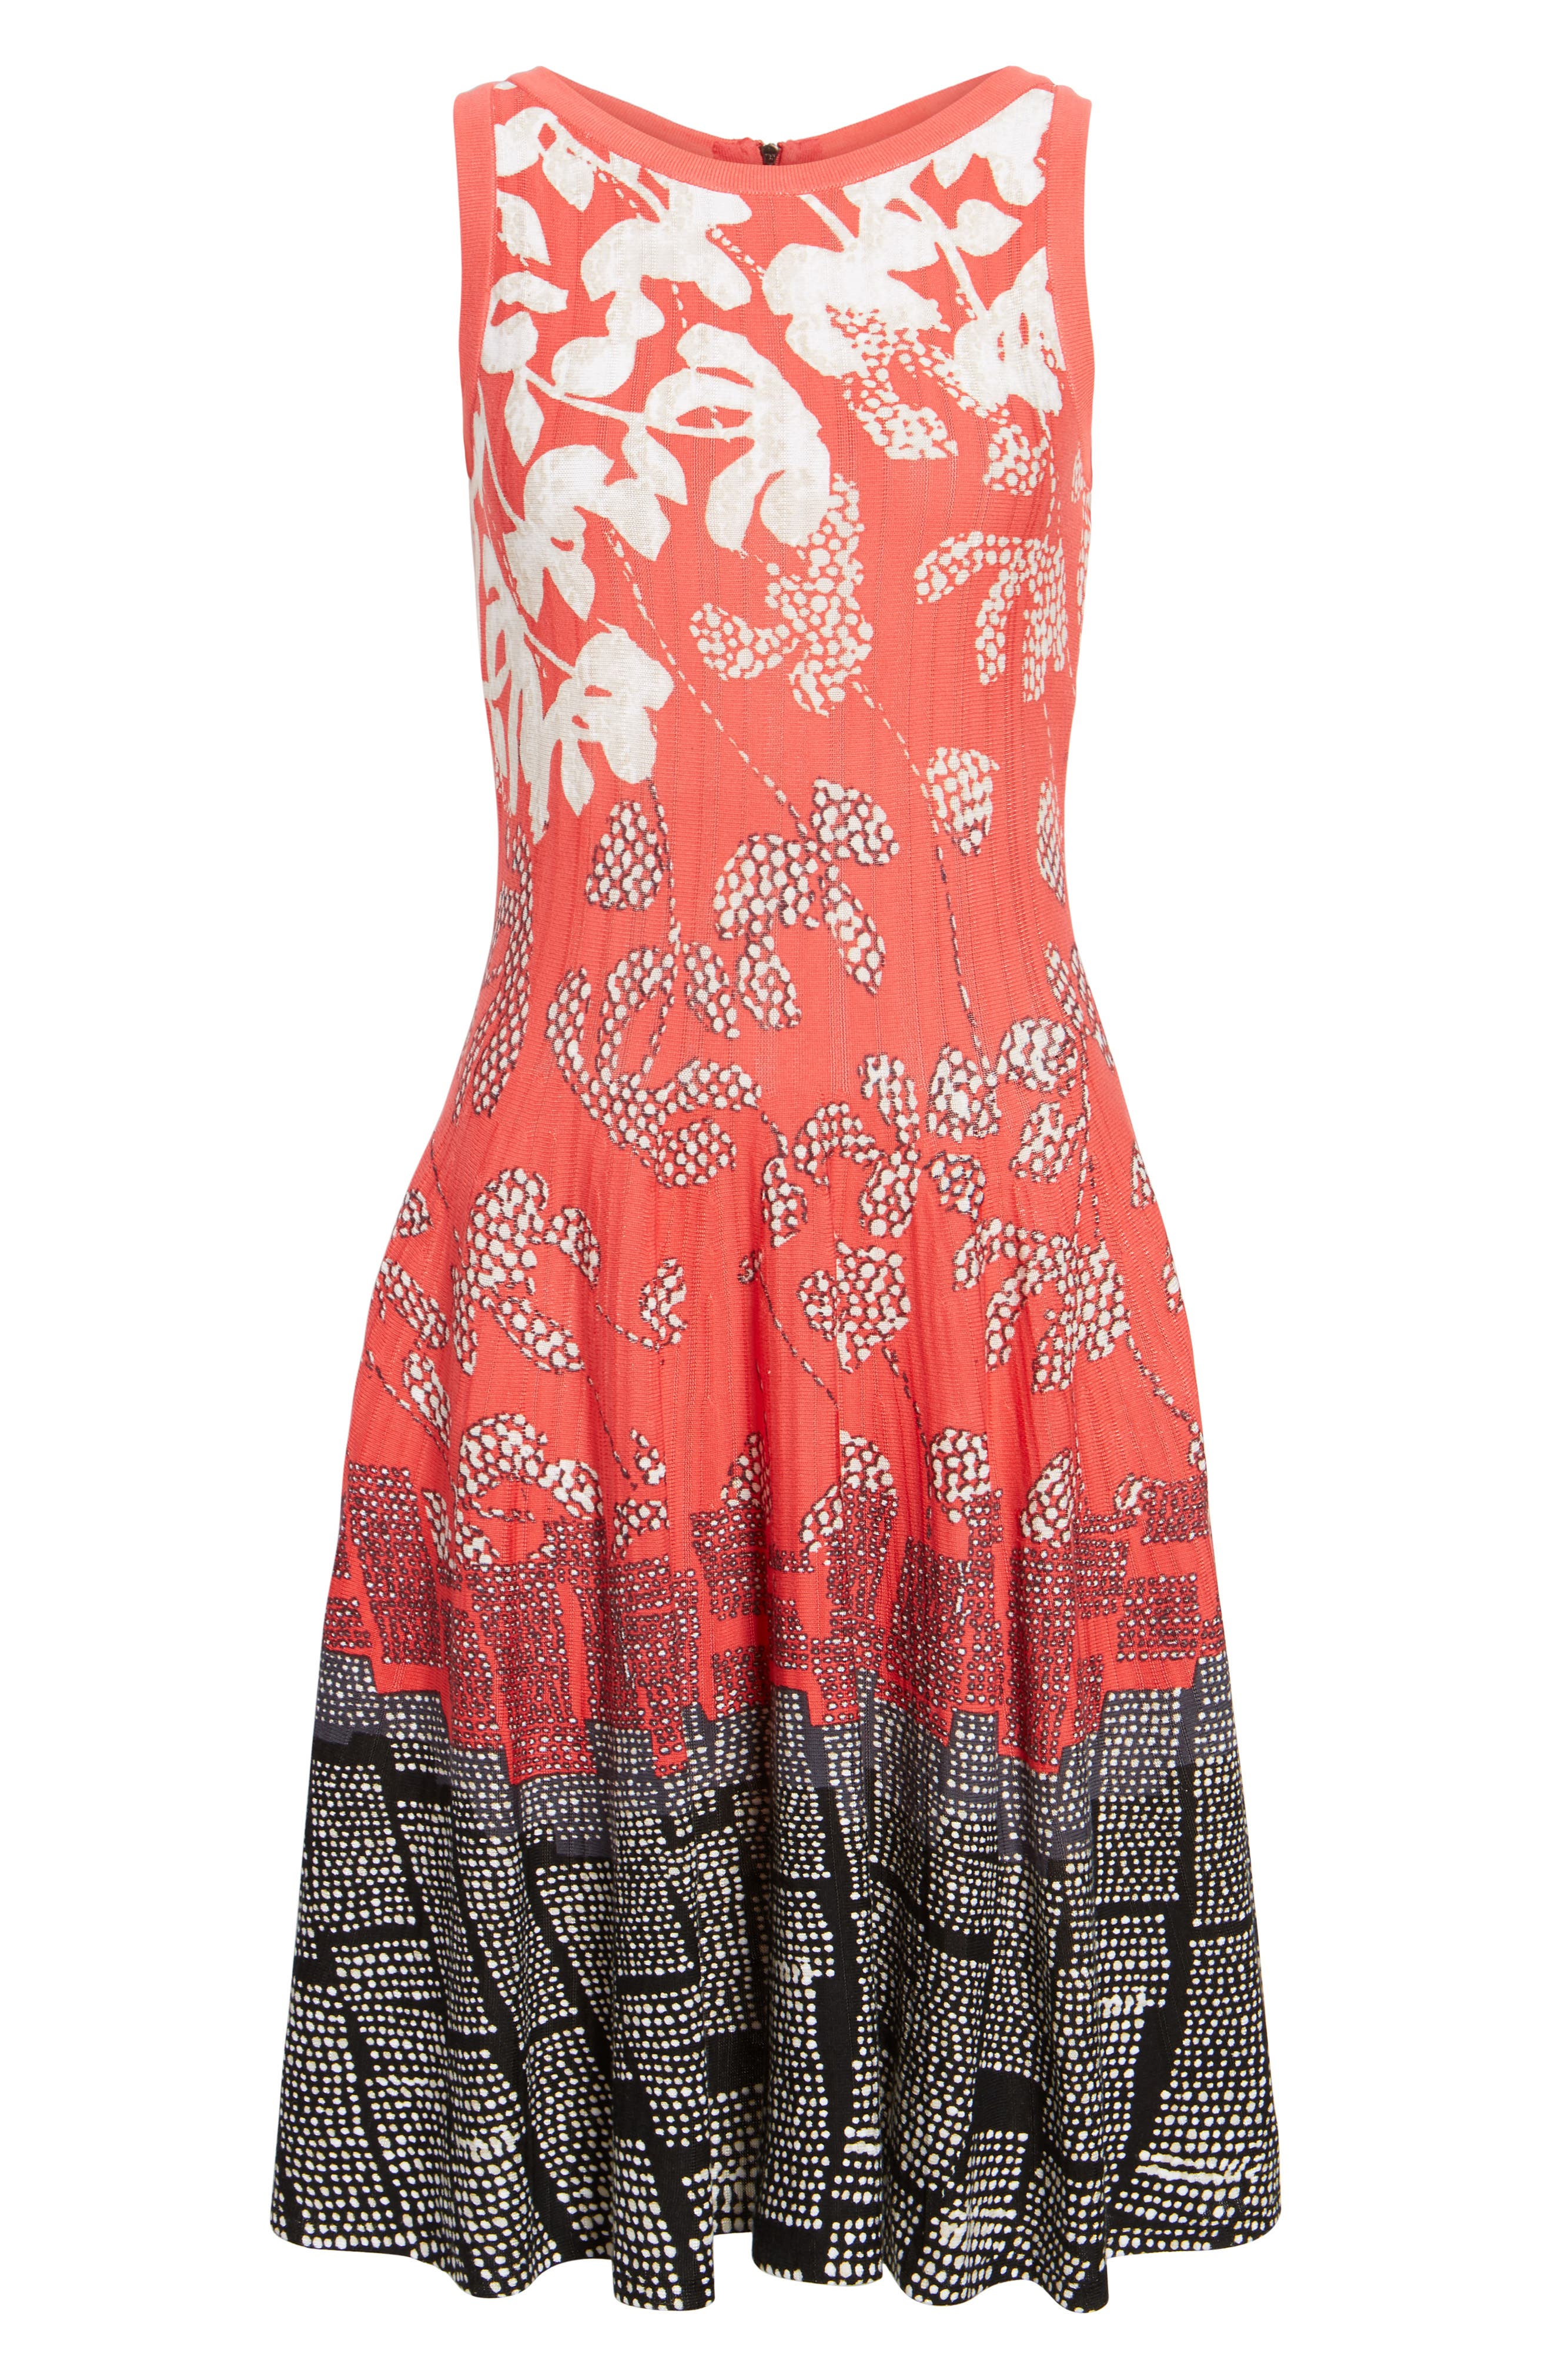 Terrace Twirl Fit & Flare Dress,                             Alternate thumbnail 6, color,